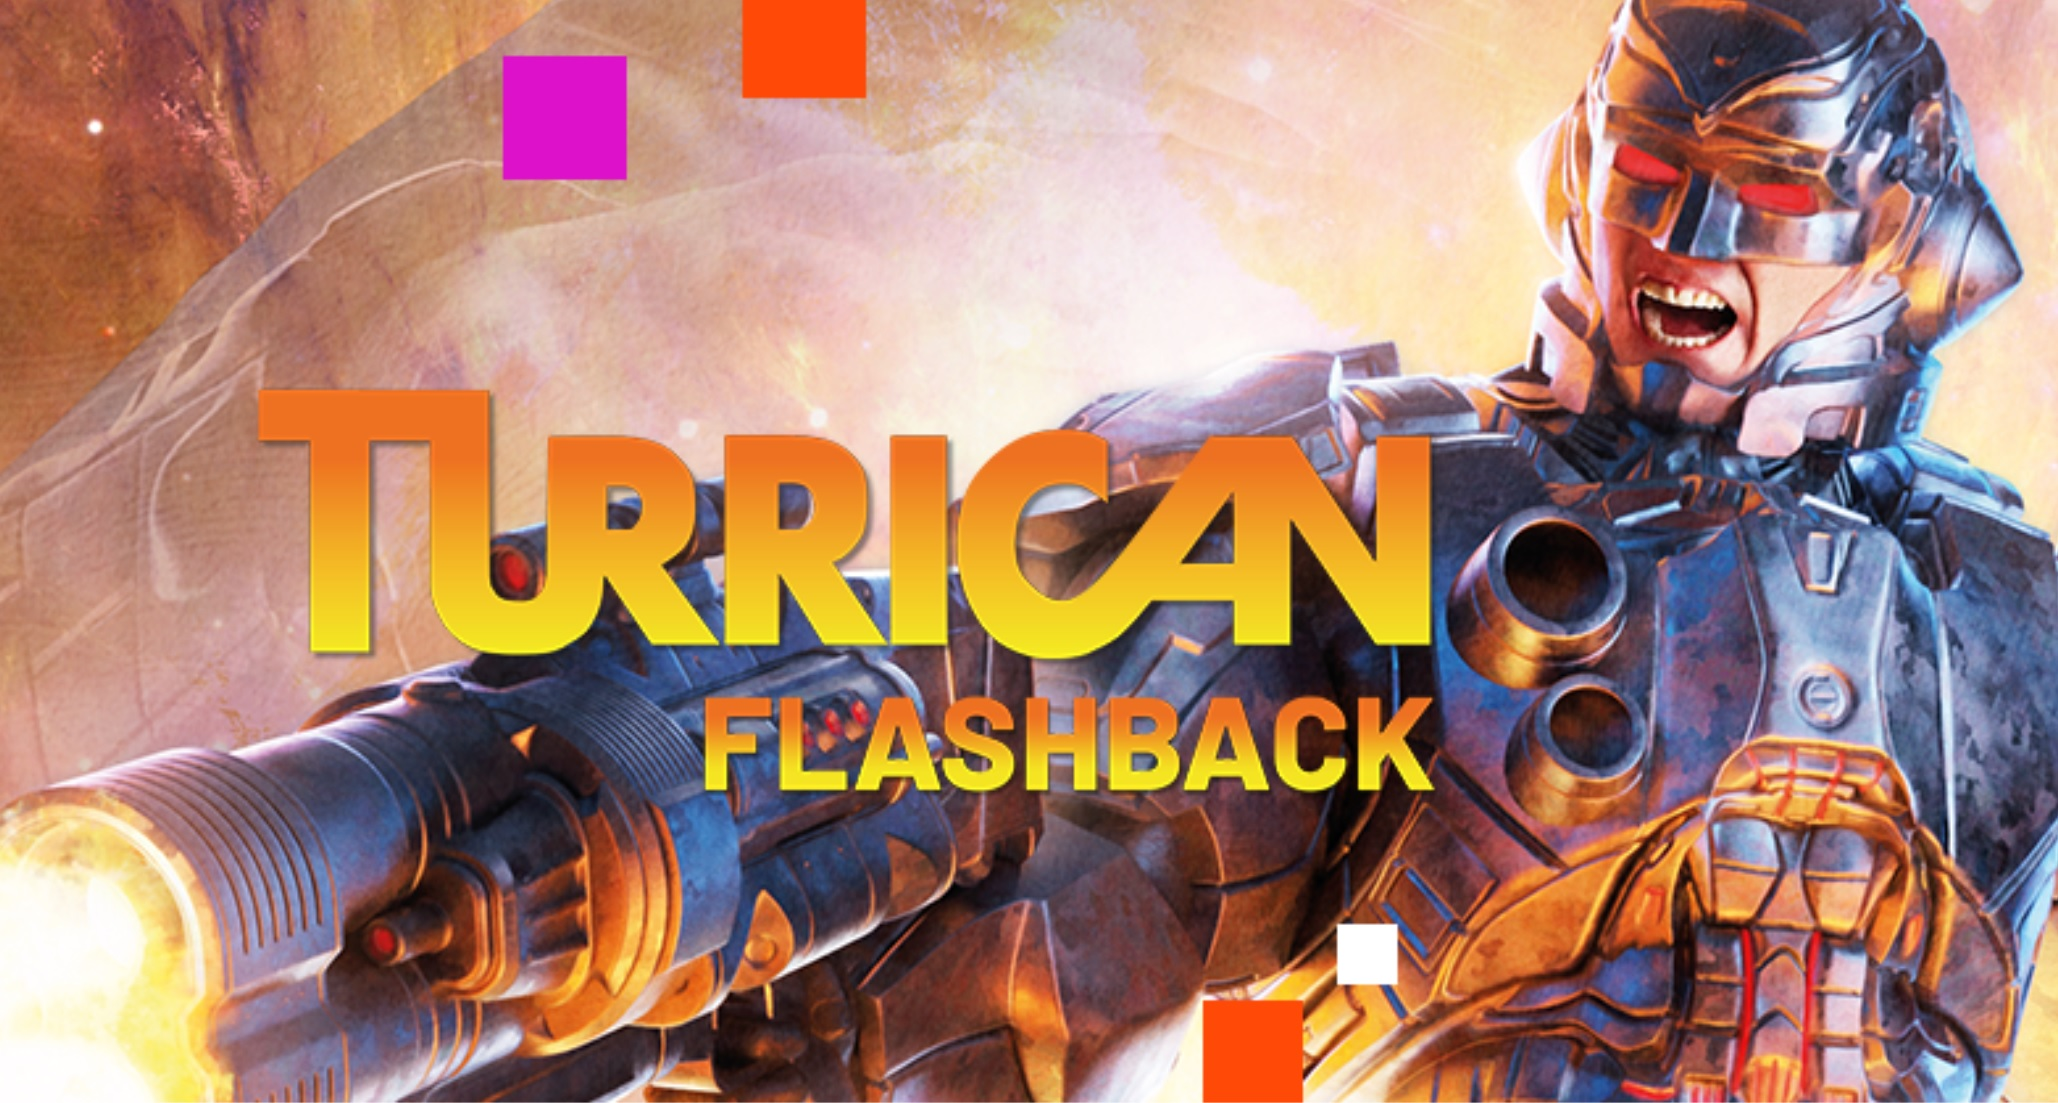 Turrican Flashback arriva il 29 gennaio